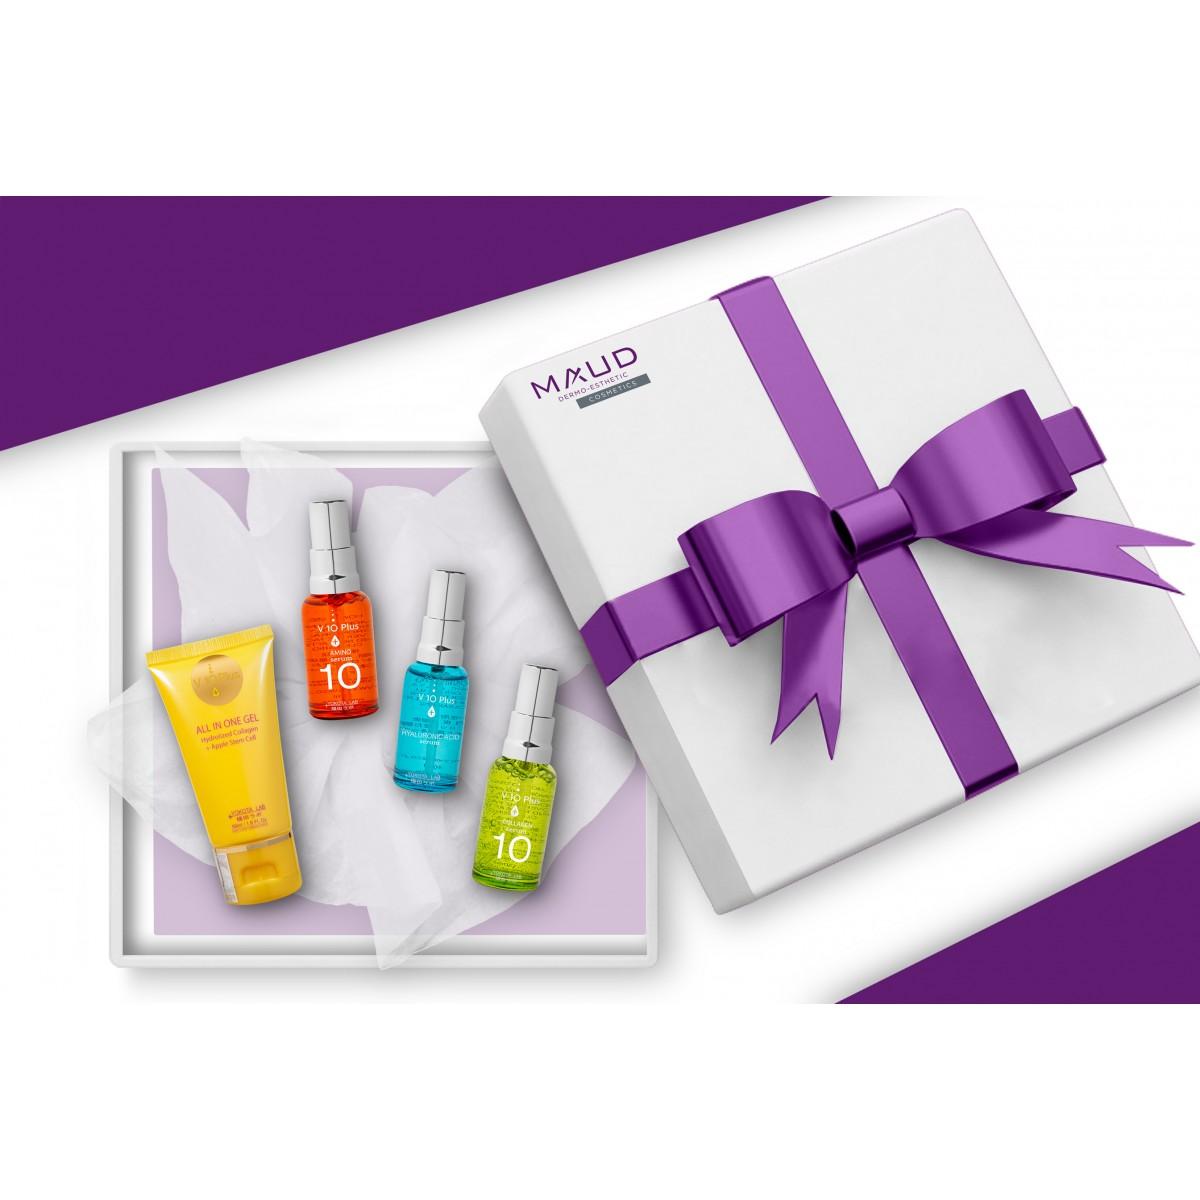 Coffrets Cadeaux - V10 PLUS - COFFRET ESSENTIEL HYDRATATION V10+